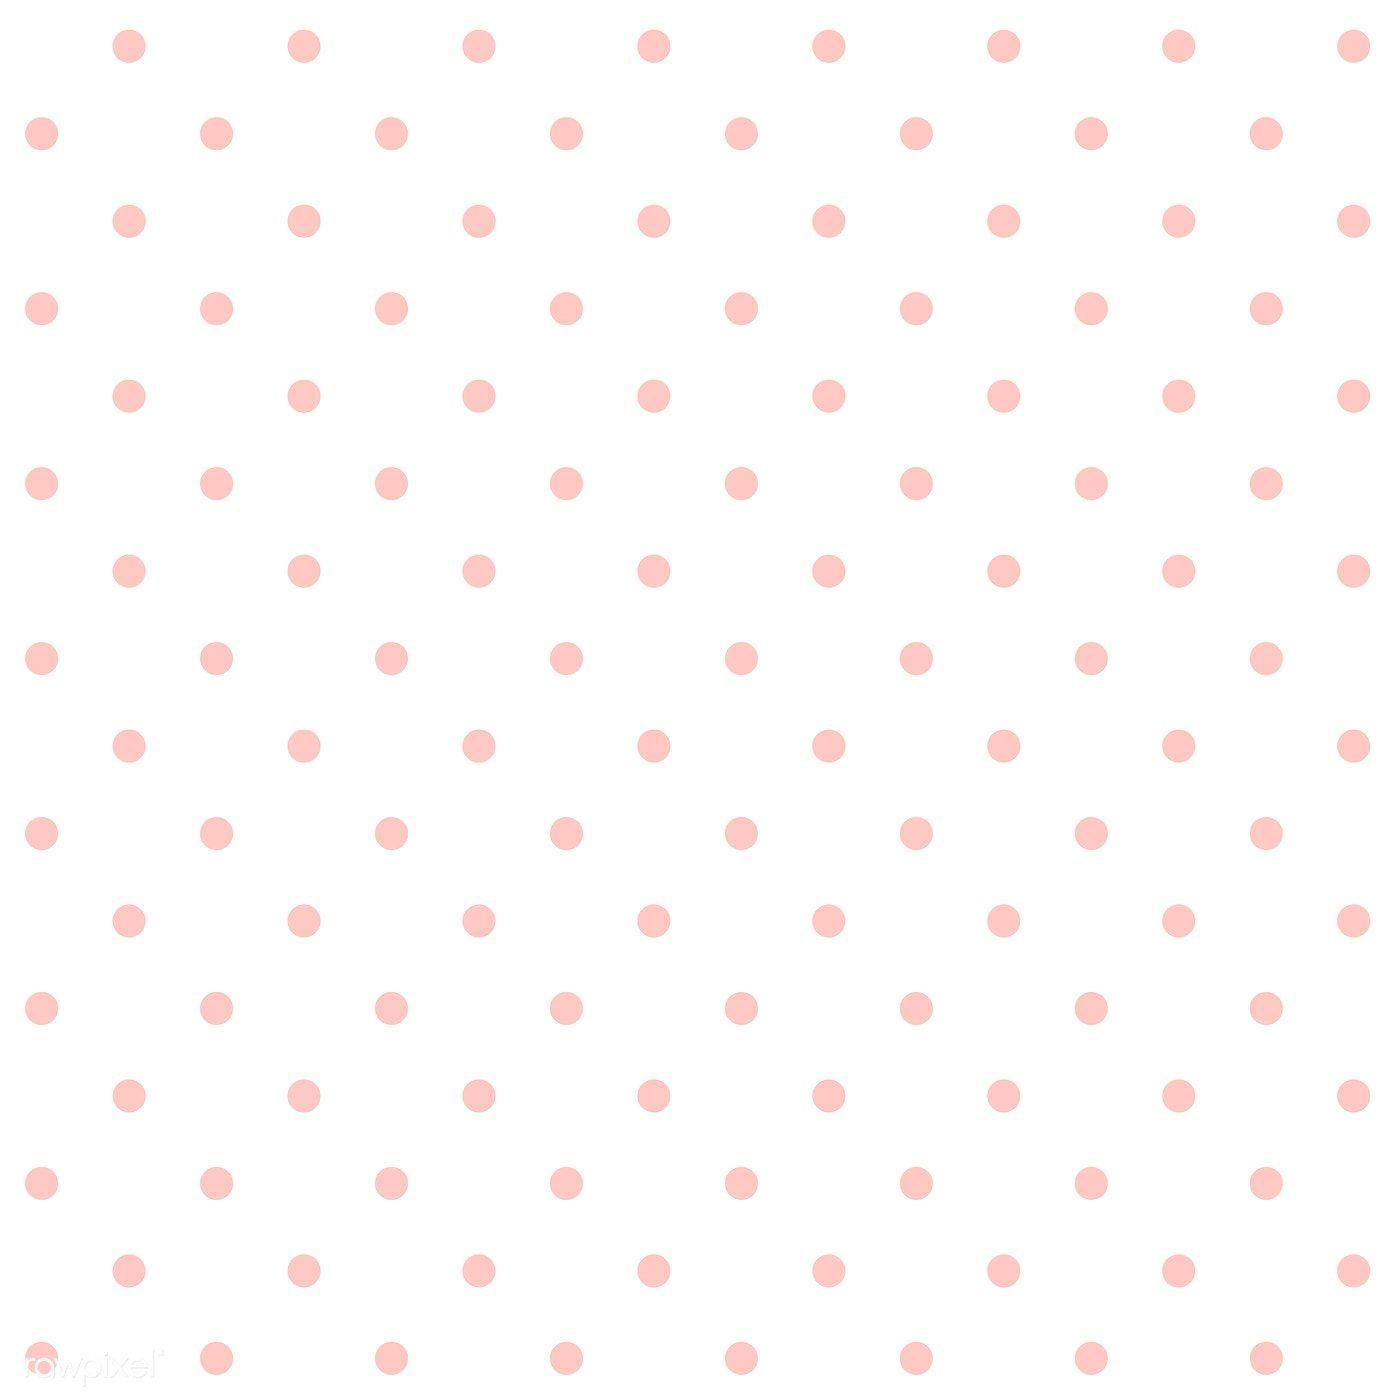 Download Premium Vector Of Pastel Pink And White Seamless Polka Dot Polka Dots Wallpaper Pink Polka Dots Background Pink Polka Dots Wallpaper